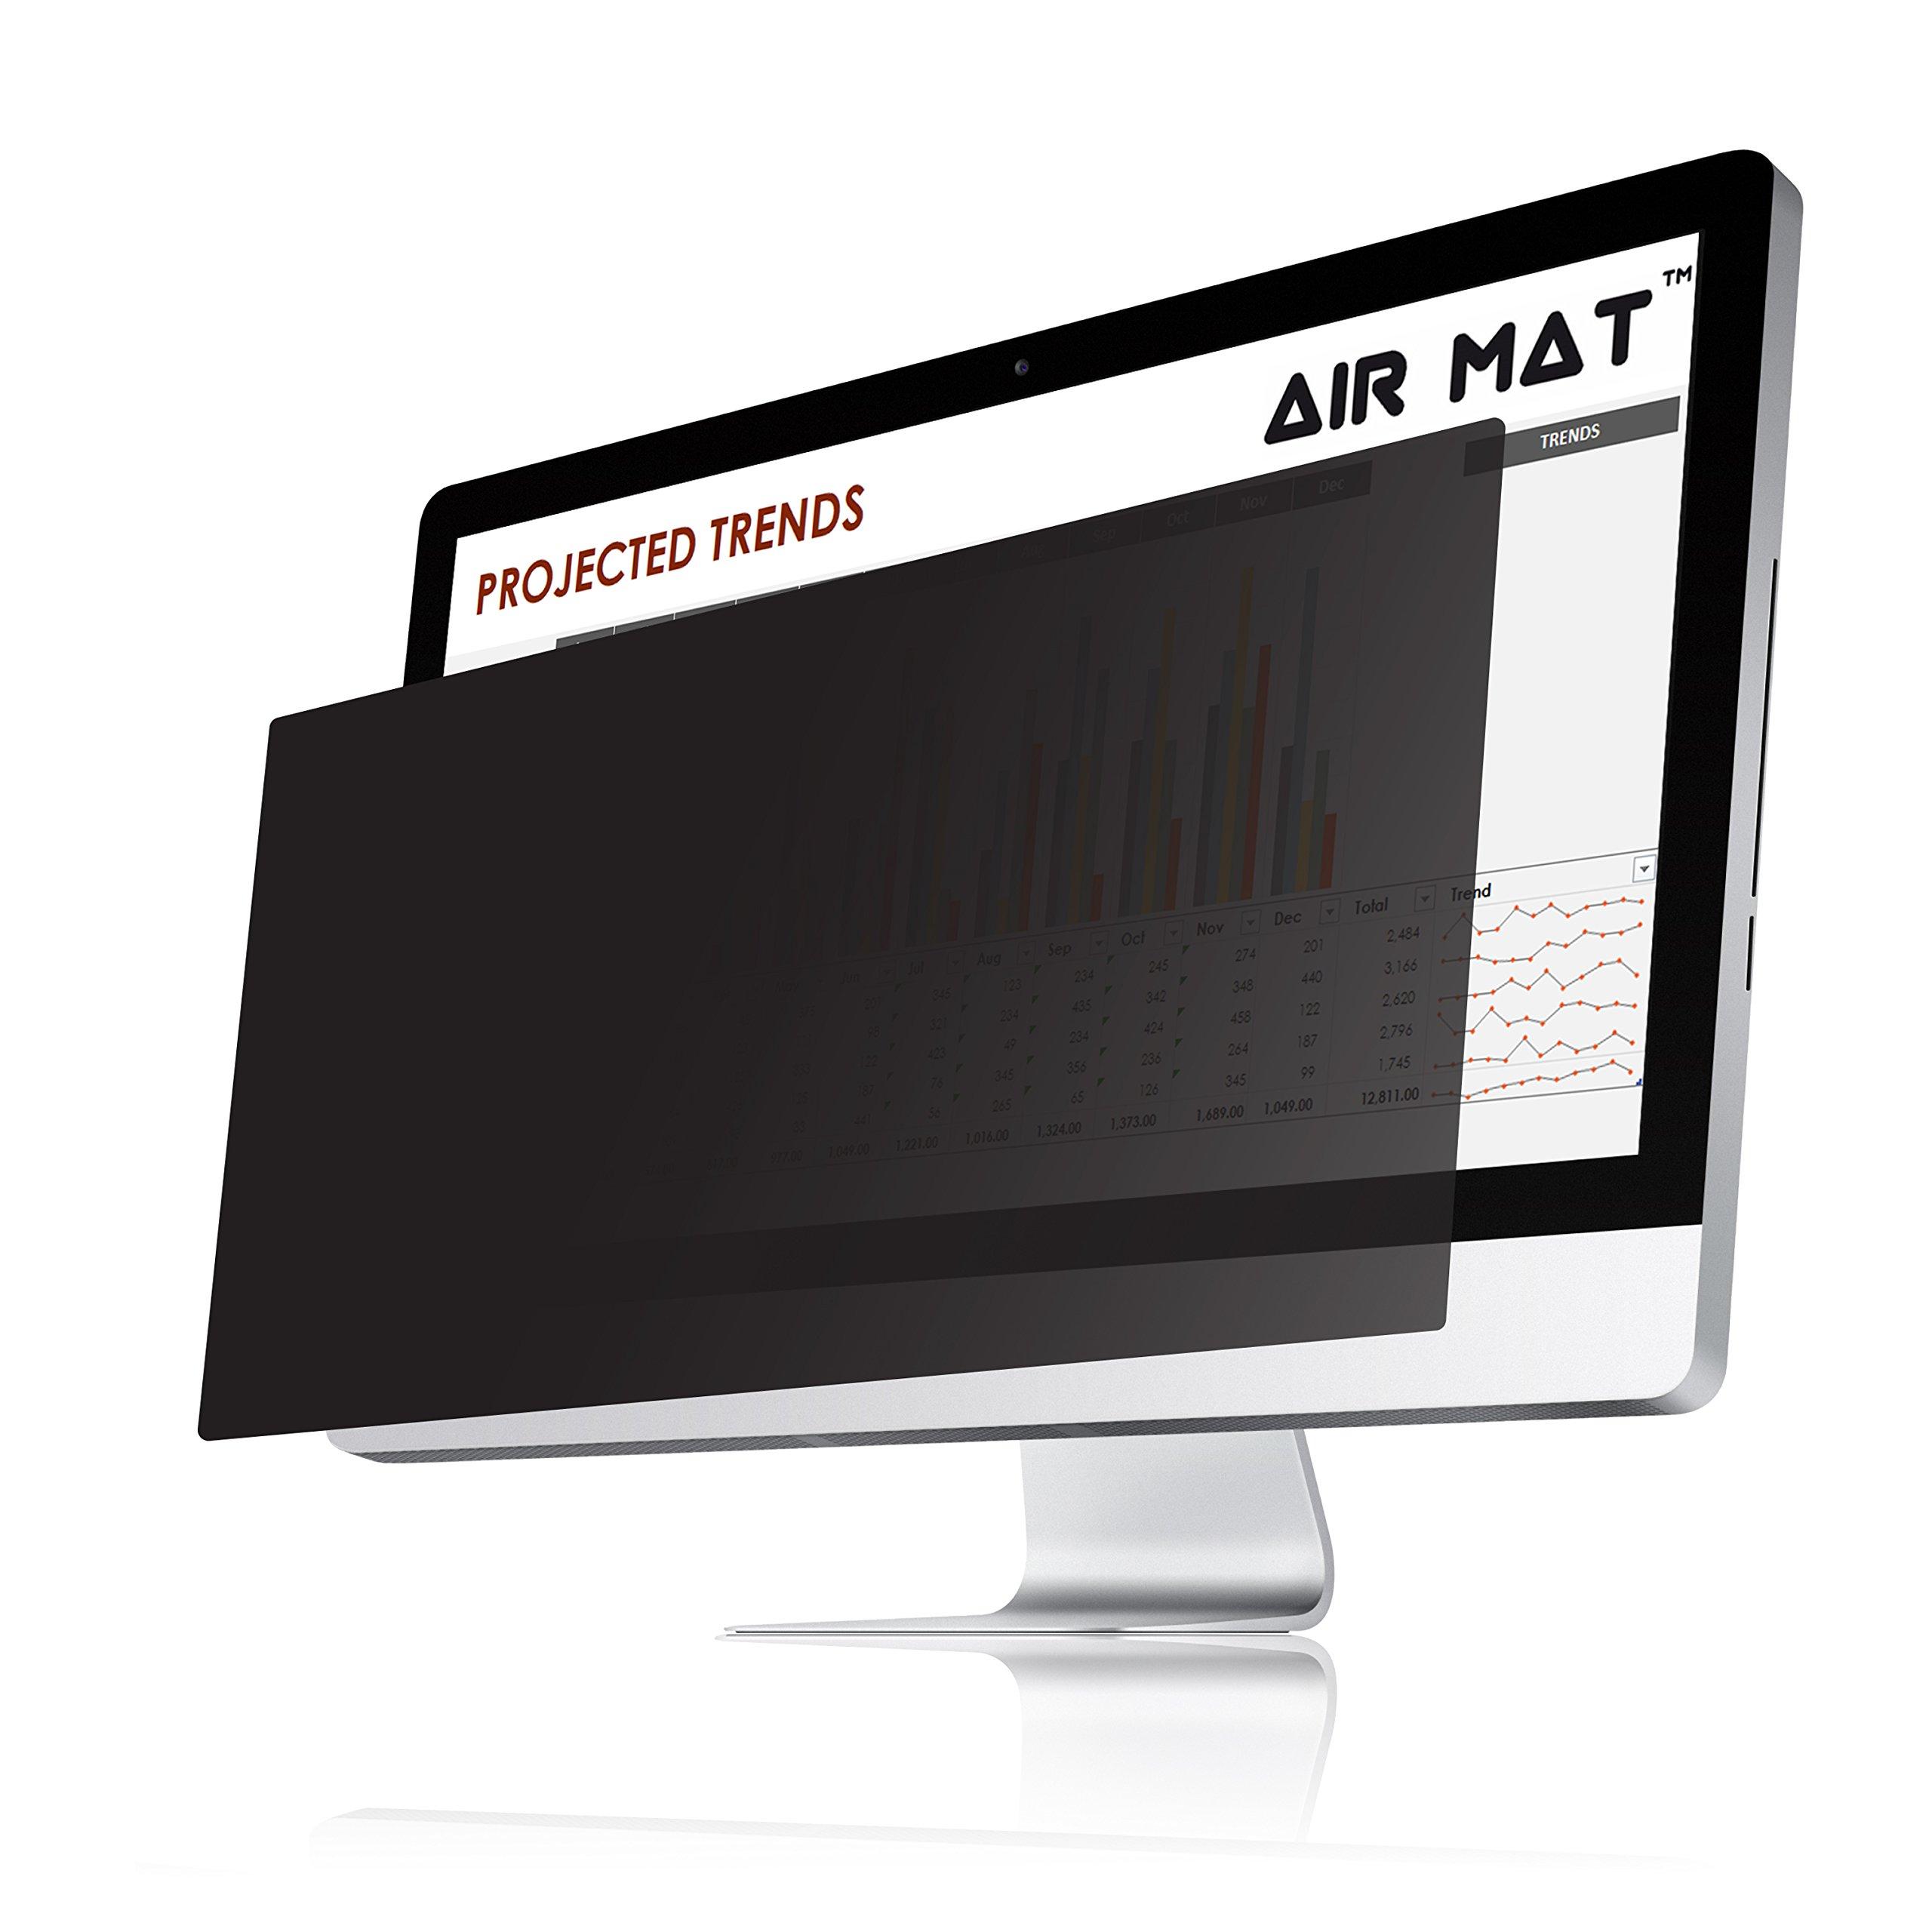 23.0 Inch Privacy Screen Filter for Widescreen Computer Monitor/LCD (16:9 Aspect Ratio). Original Anti Glare Protector Film for Data confidentiality - (23'' W9) - Measure Screen Carefully